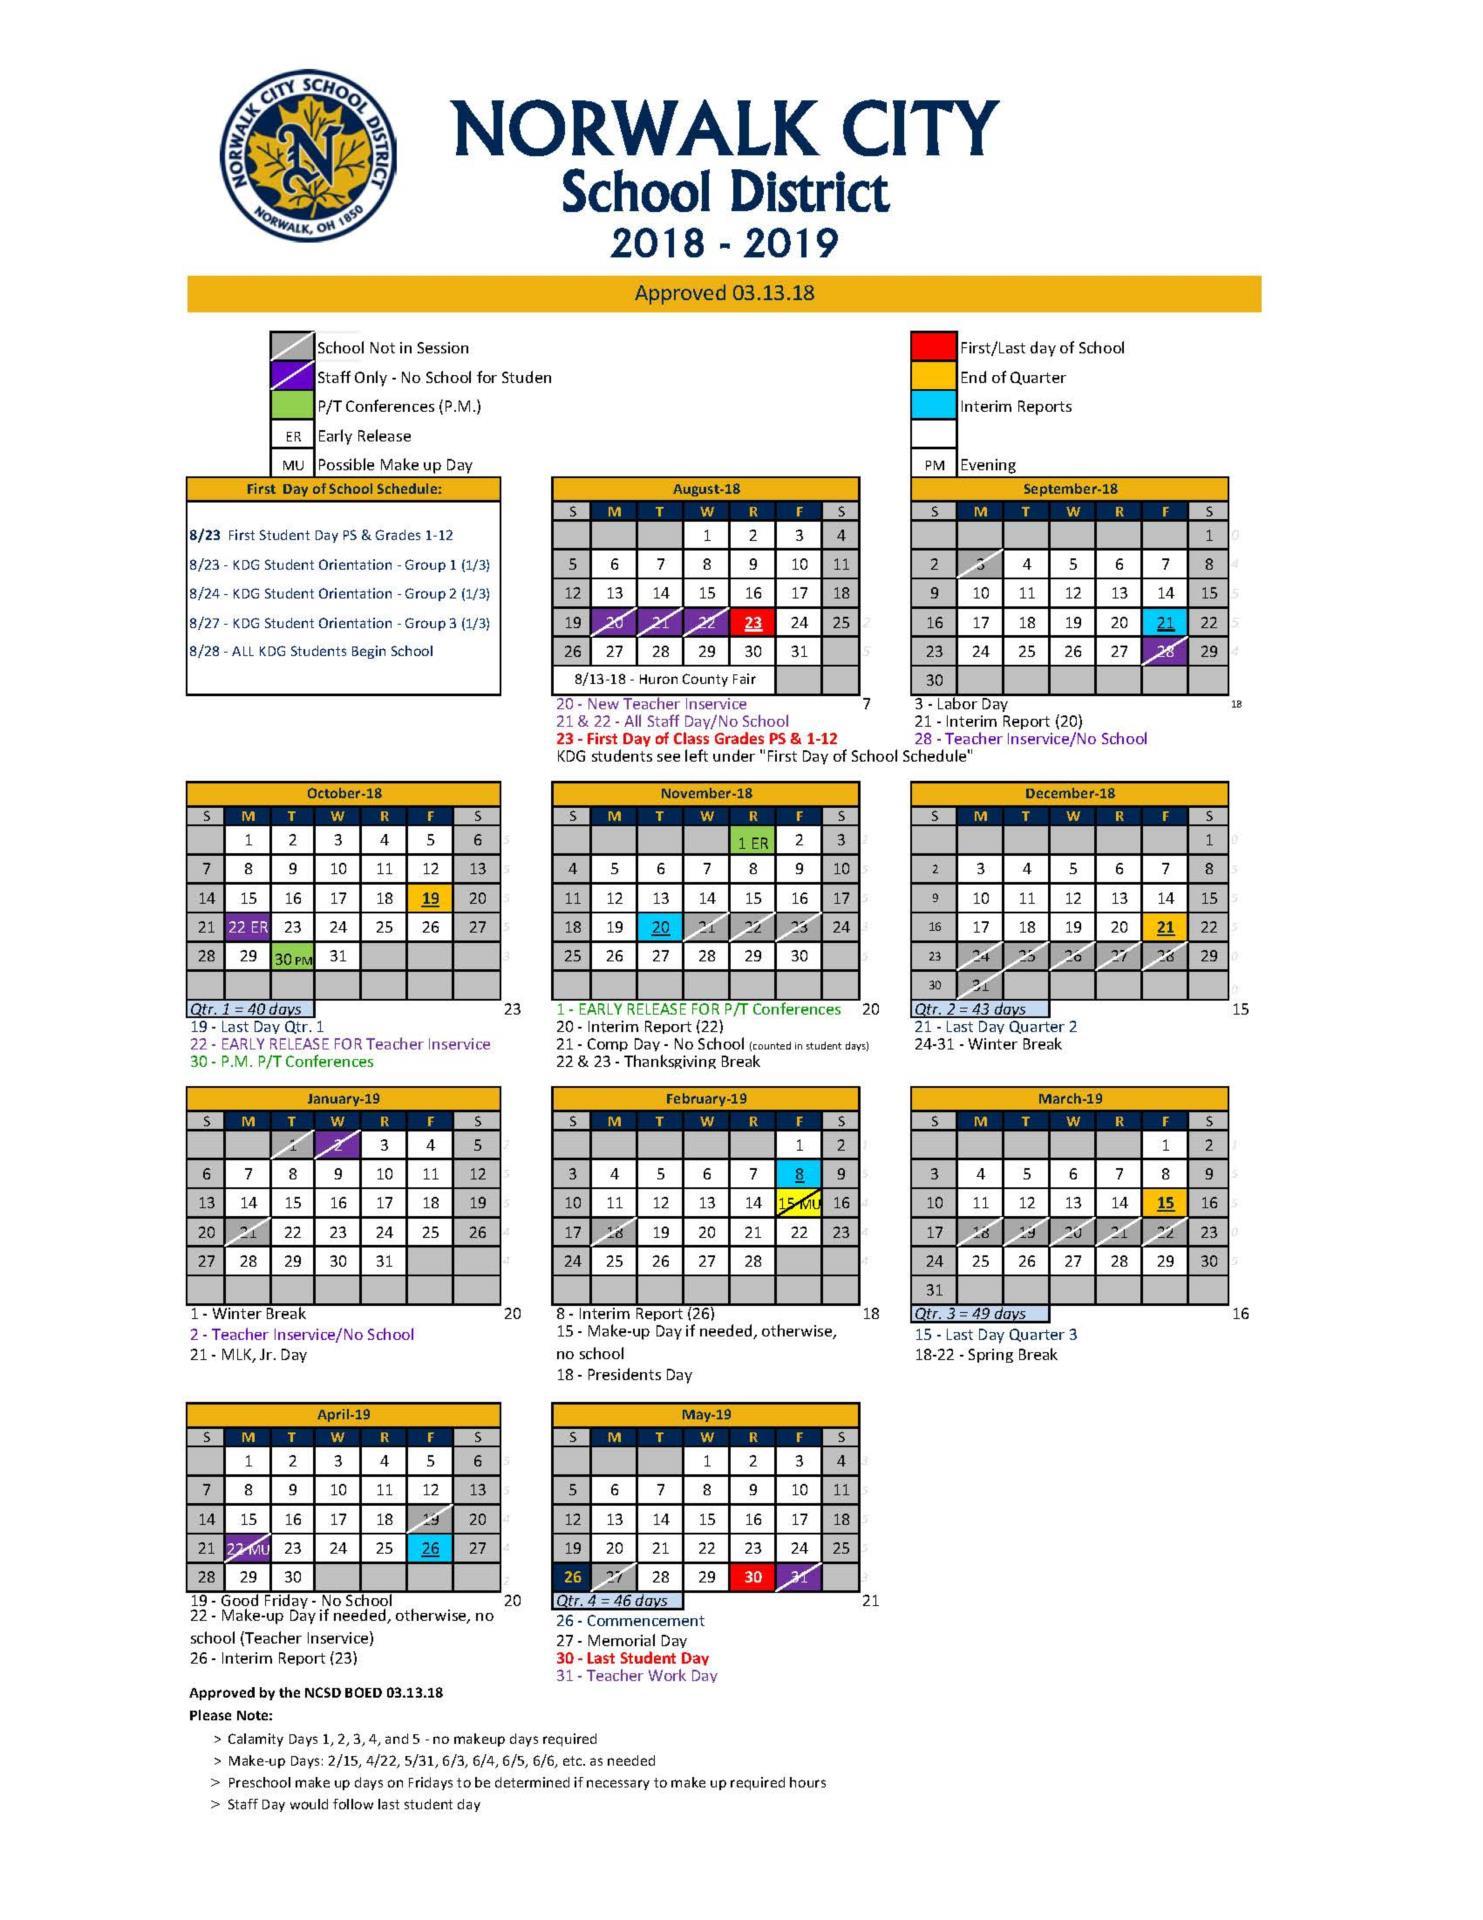 18-19 Calendar pg 1